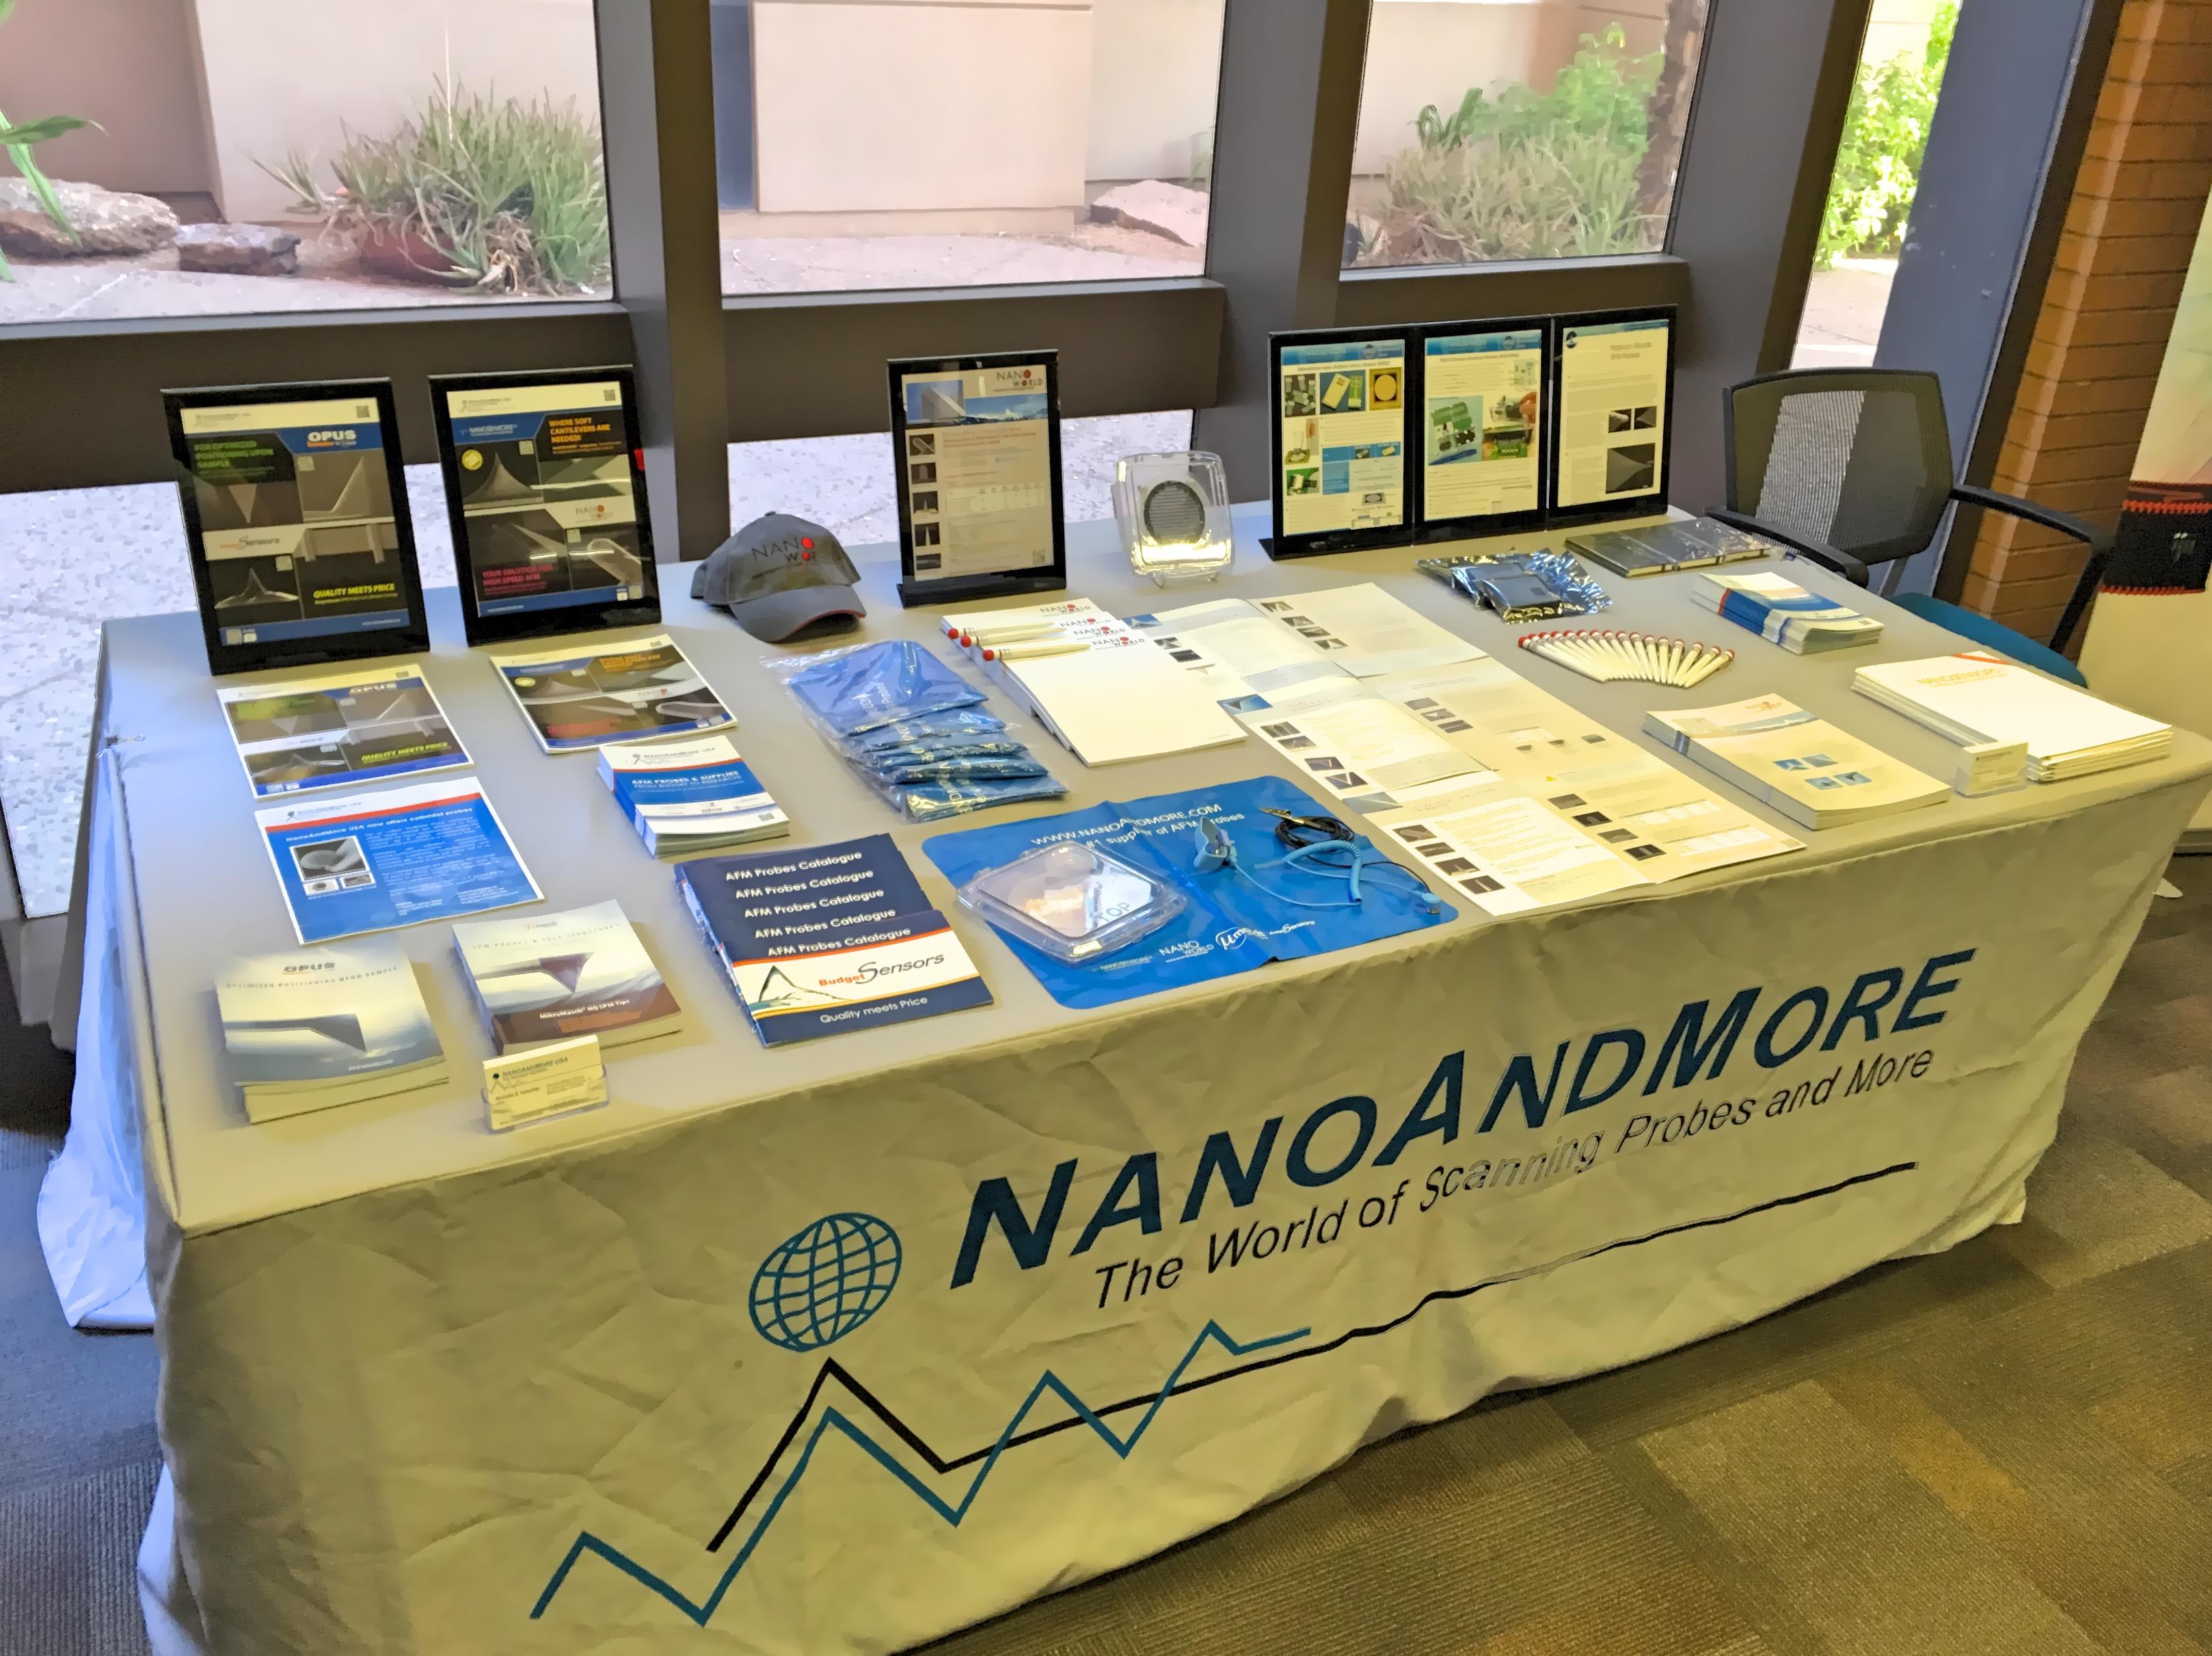 NanoAndMore USA table at the International Scanning Probe Microscopy 2018 conference at Arizona State University in Tempe Arizona